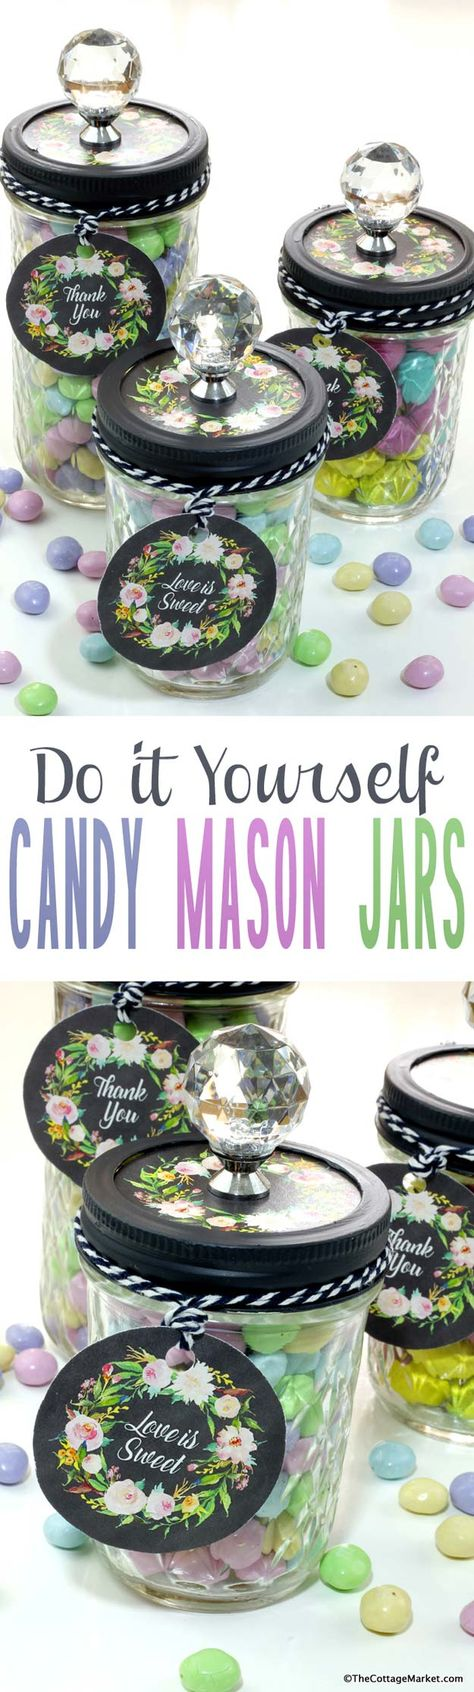 DIY Mason Jar Gift Ideas for Teens-Best Christmas Presents